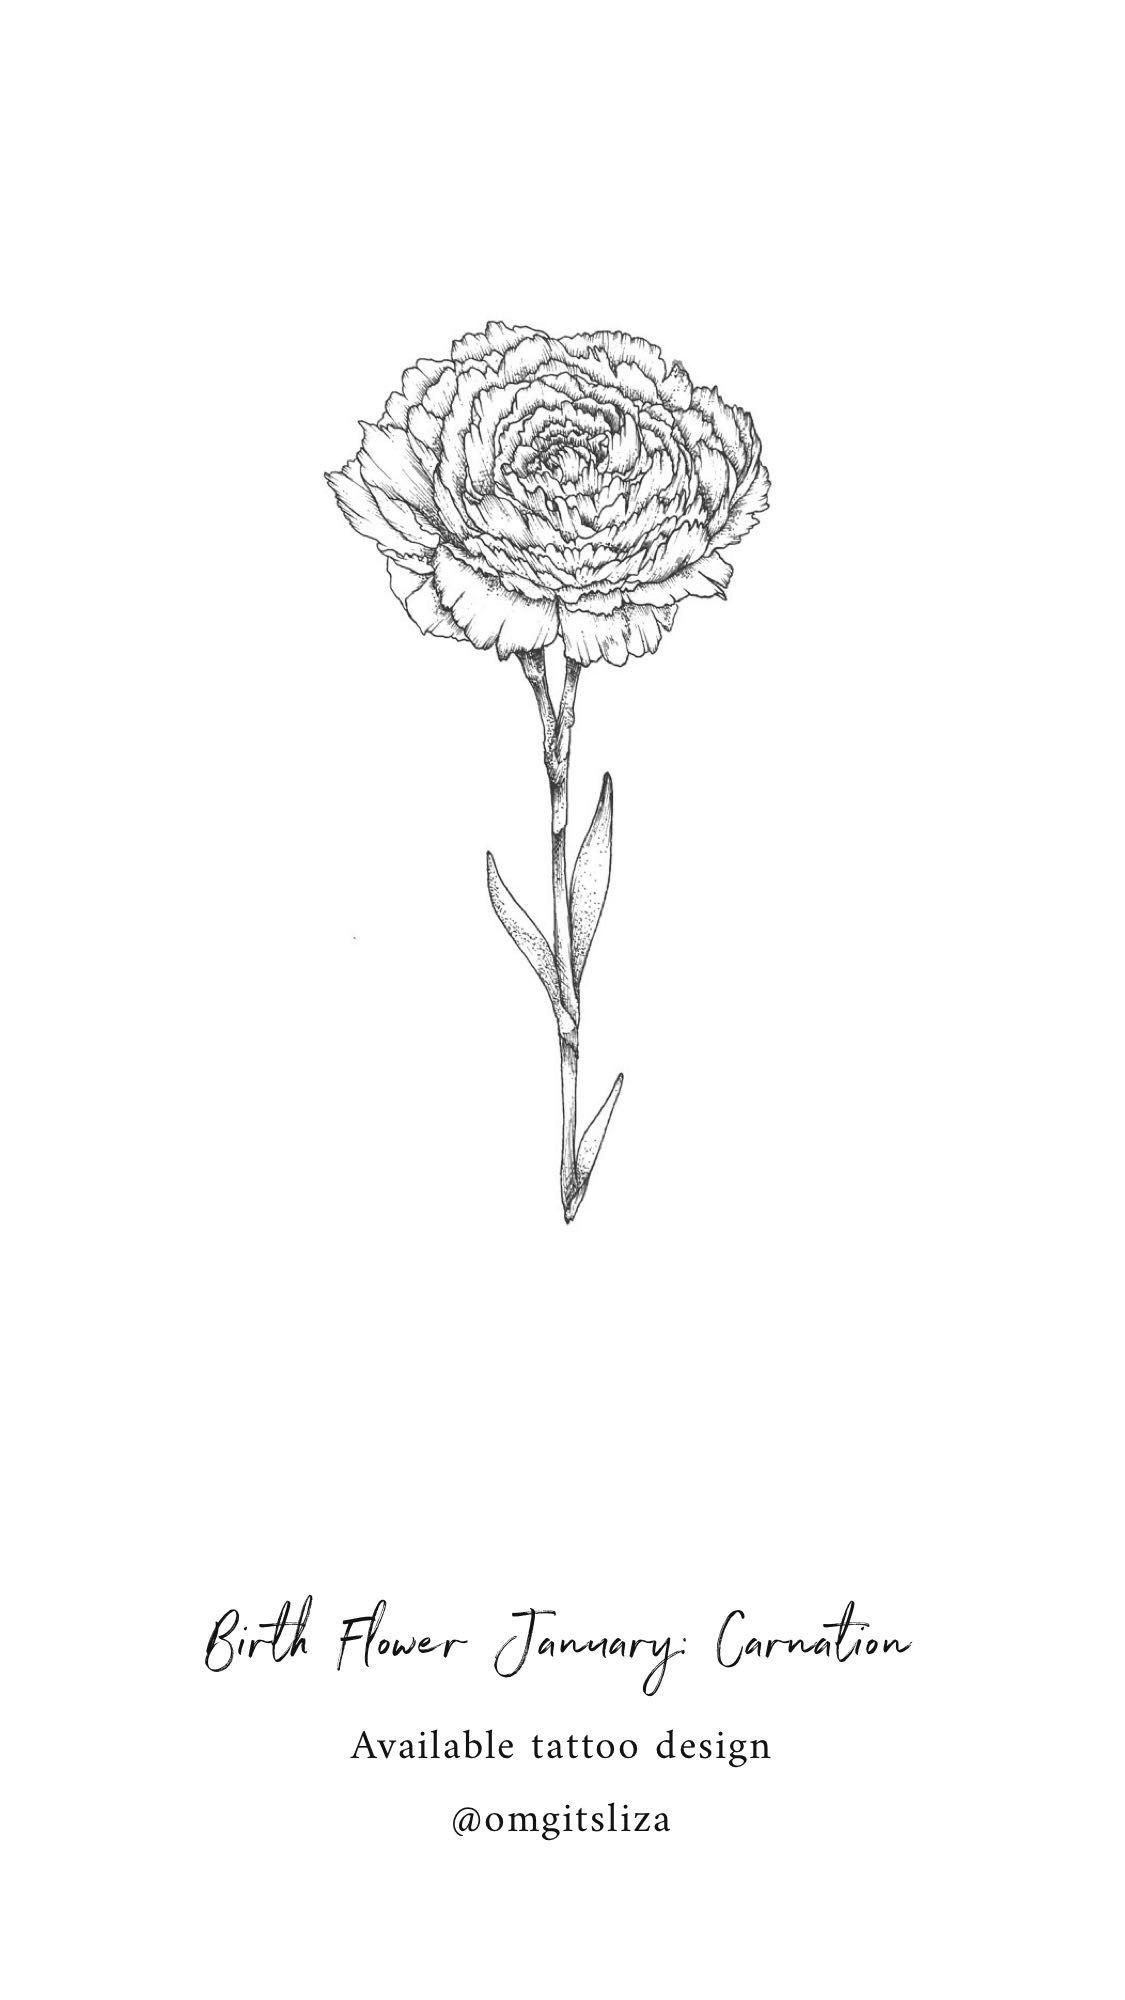 Birth Flower January Carnation Tattoo Design Illustration By